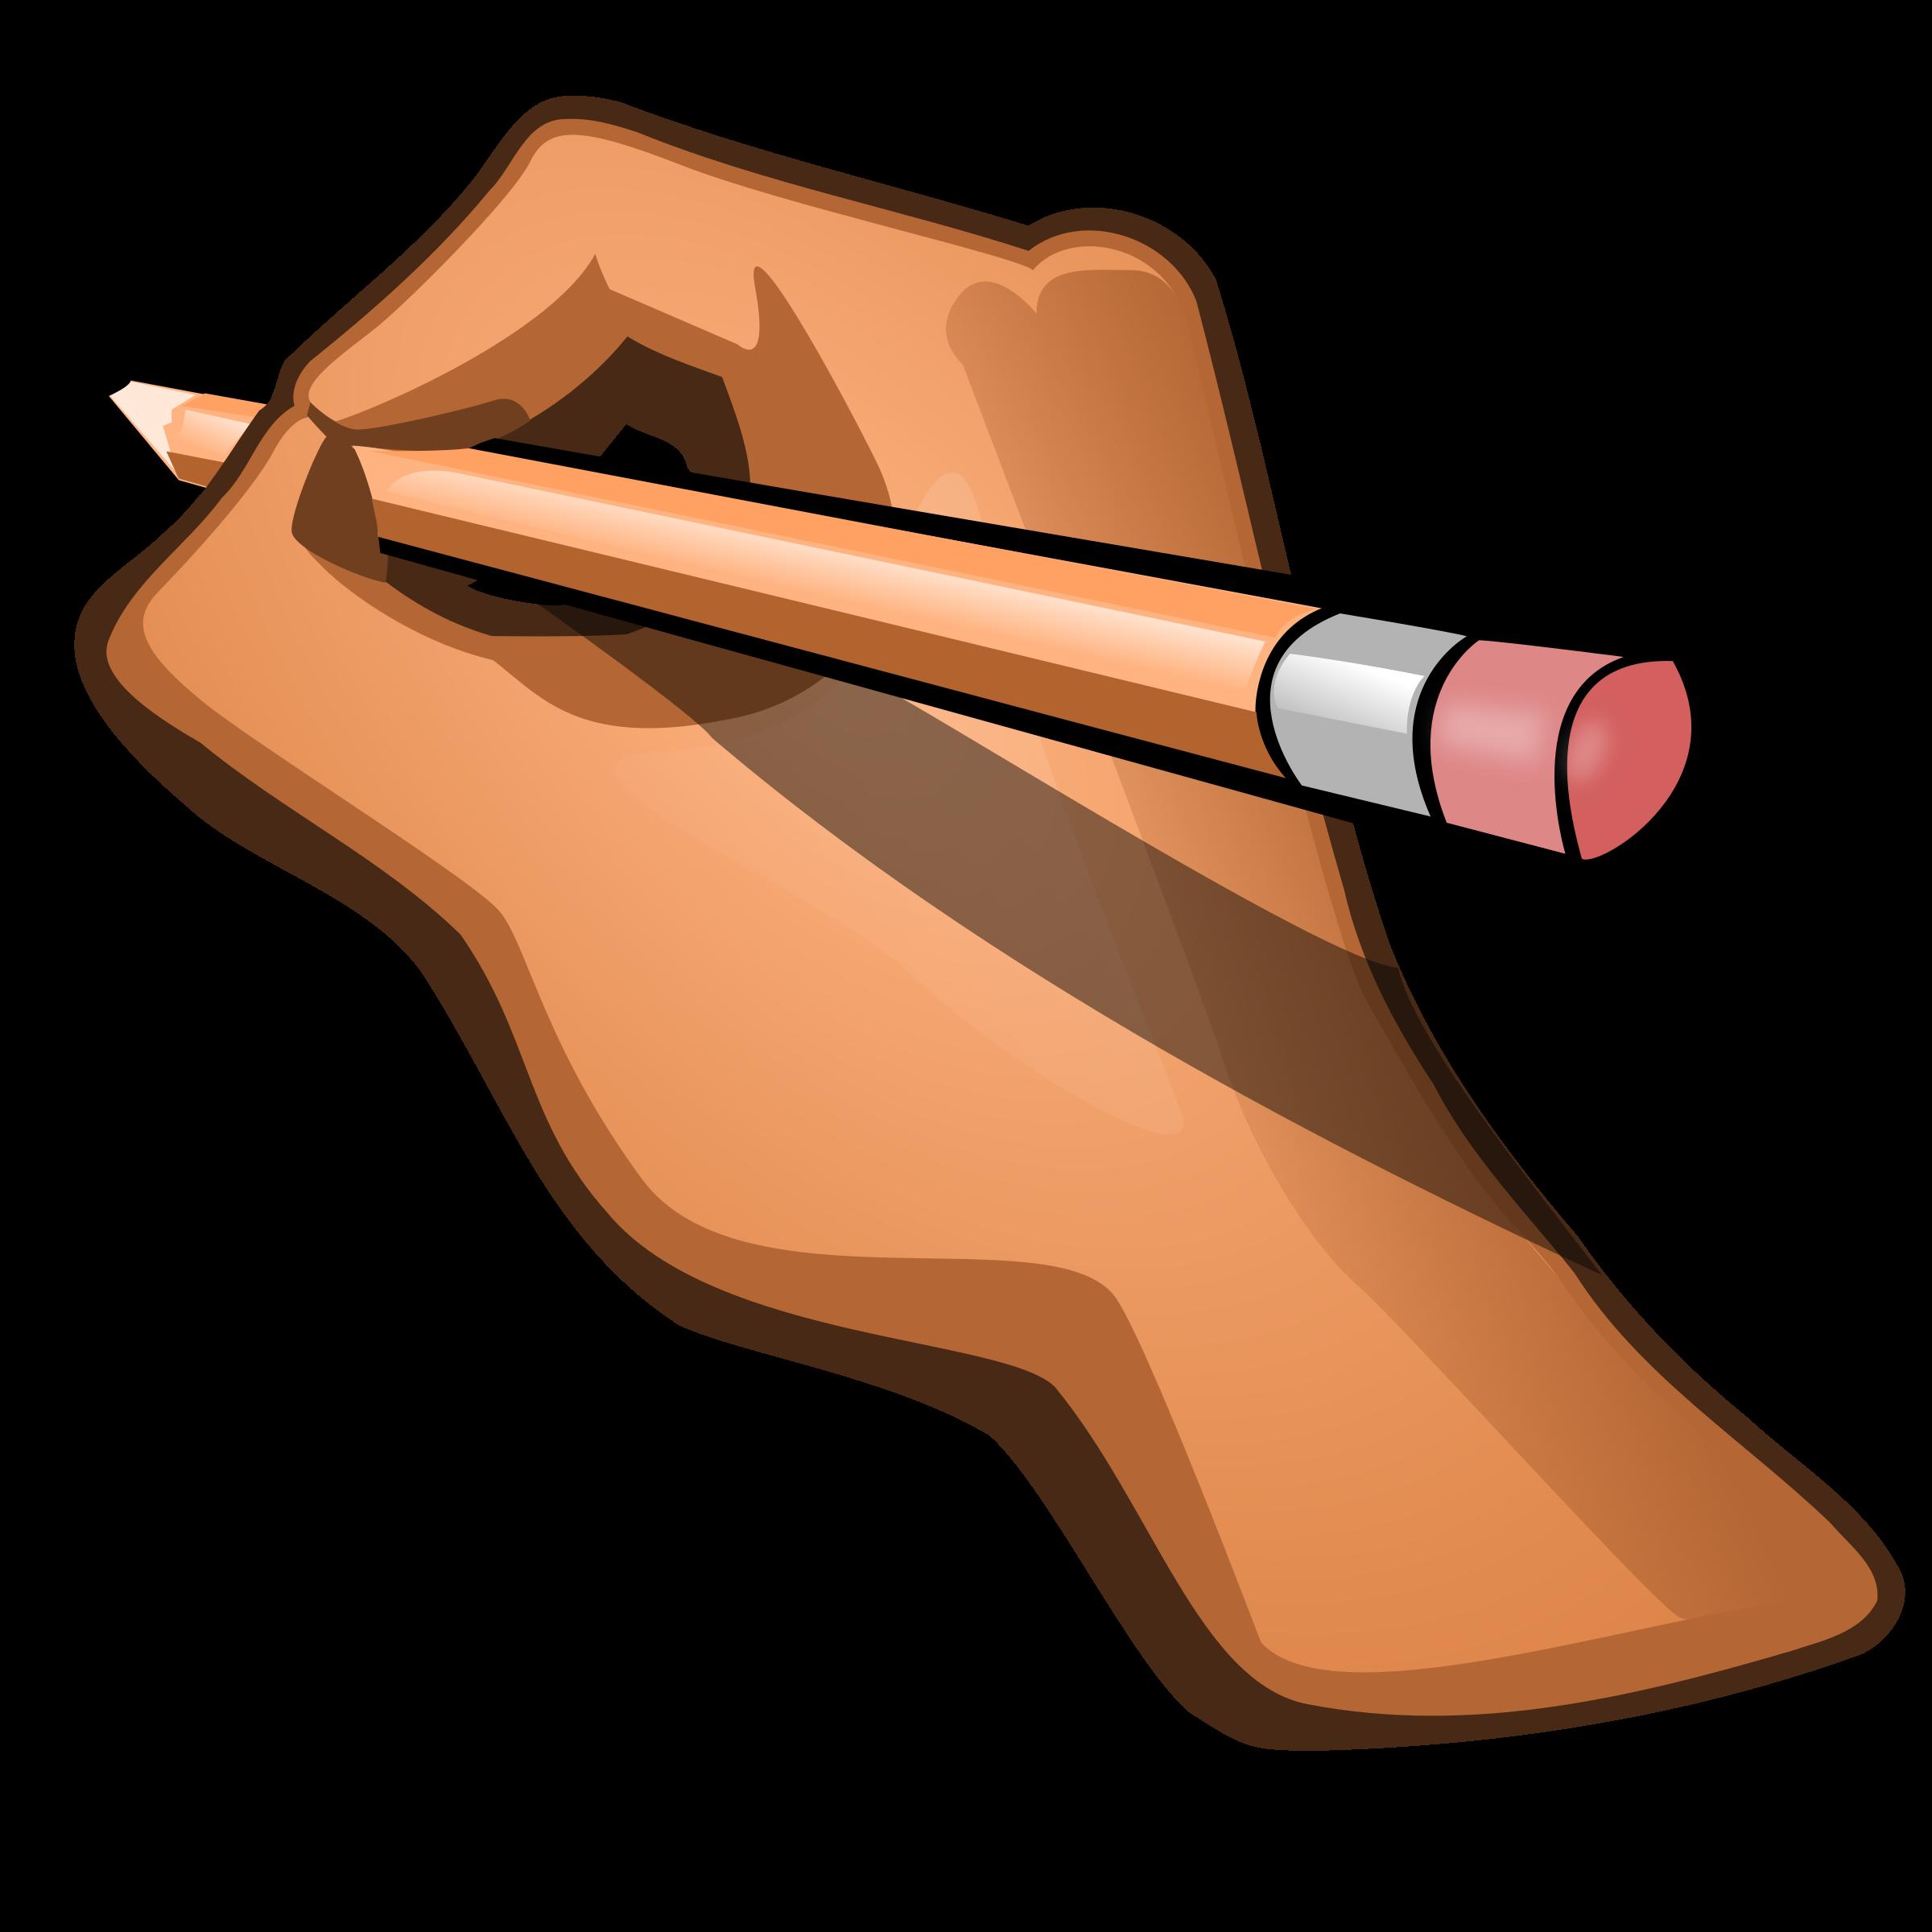 Hand pencil png desktop. Clipart writing handwriting practice